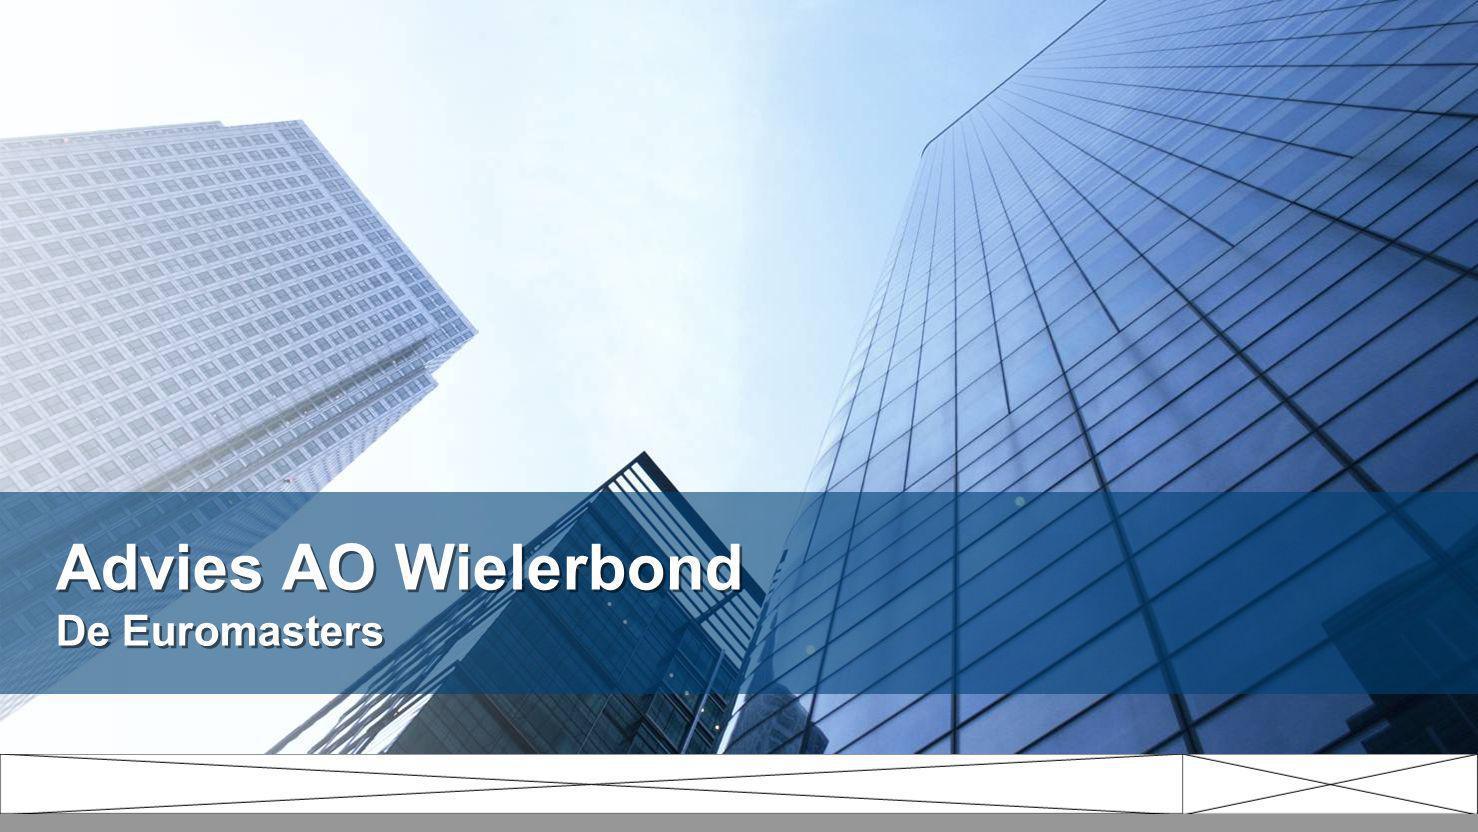 Advies AO Wielerbond De Euromasters